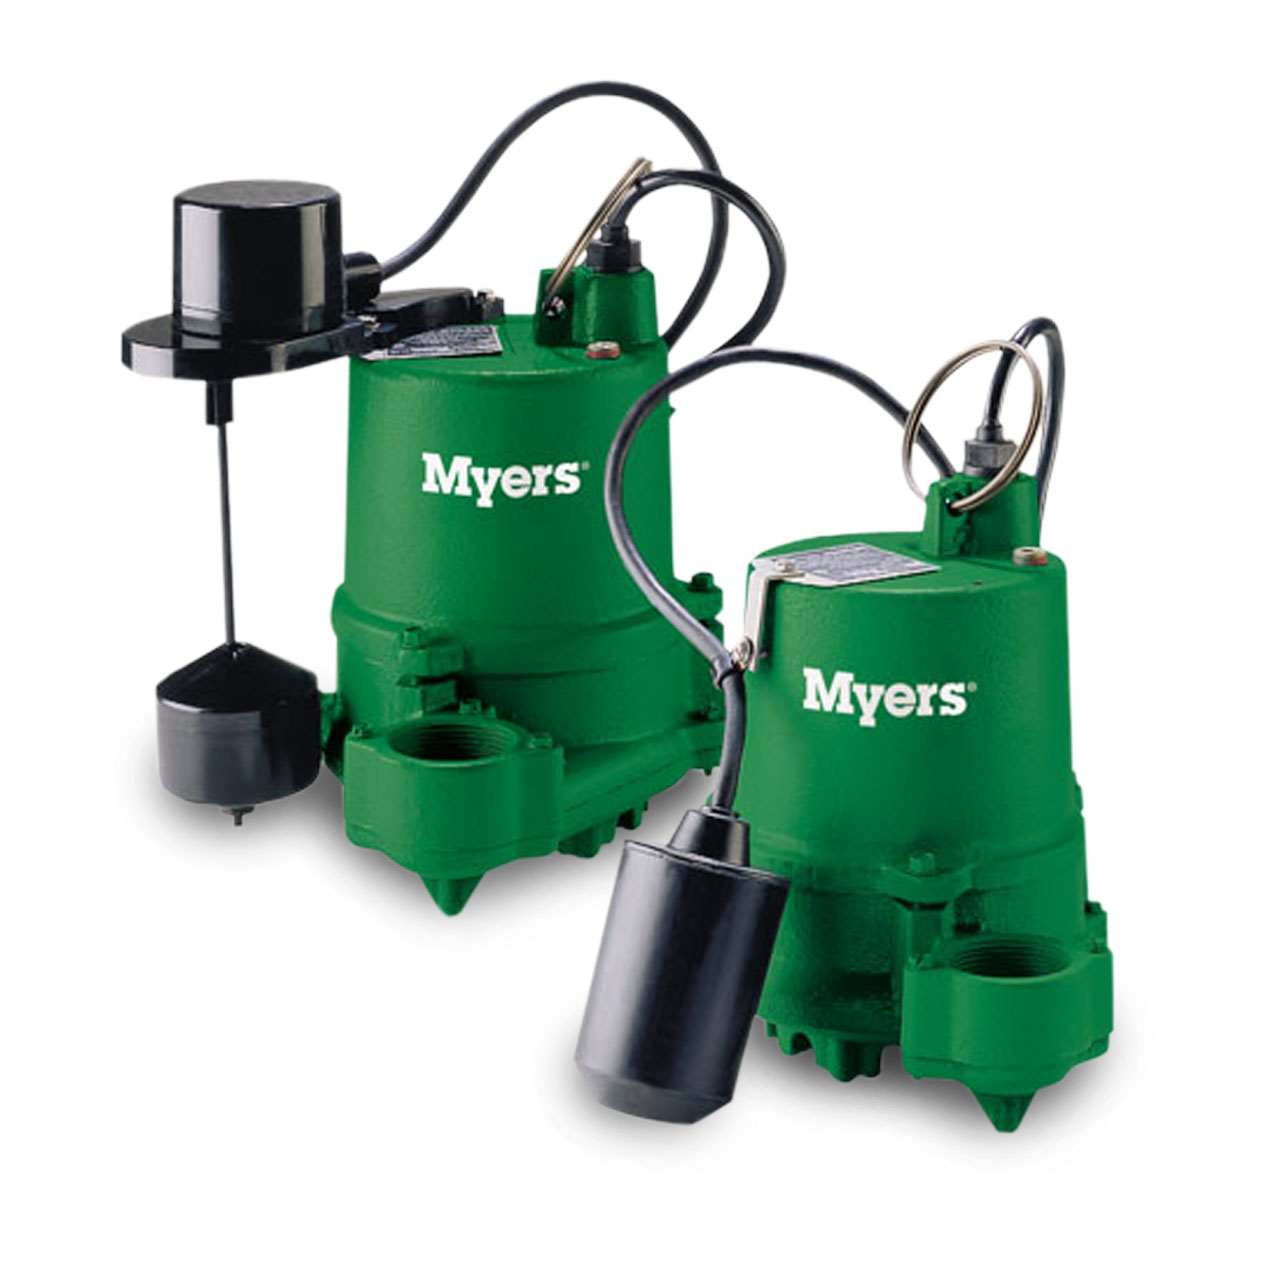 Myers Myers Ssm33ip 1 Sump Pump 0 33 Hp 115v 10 Cord